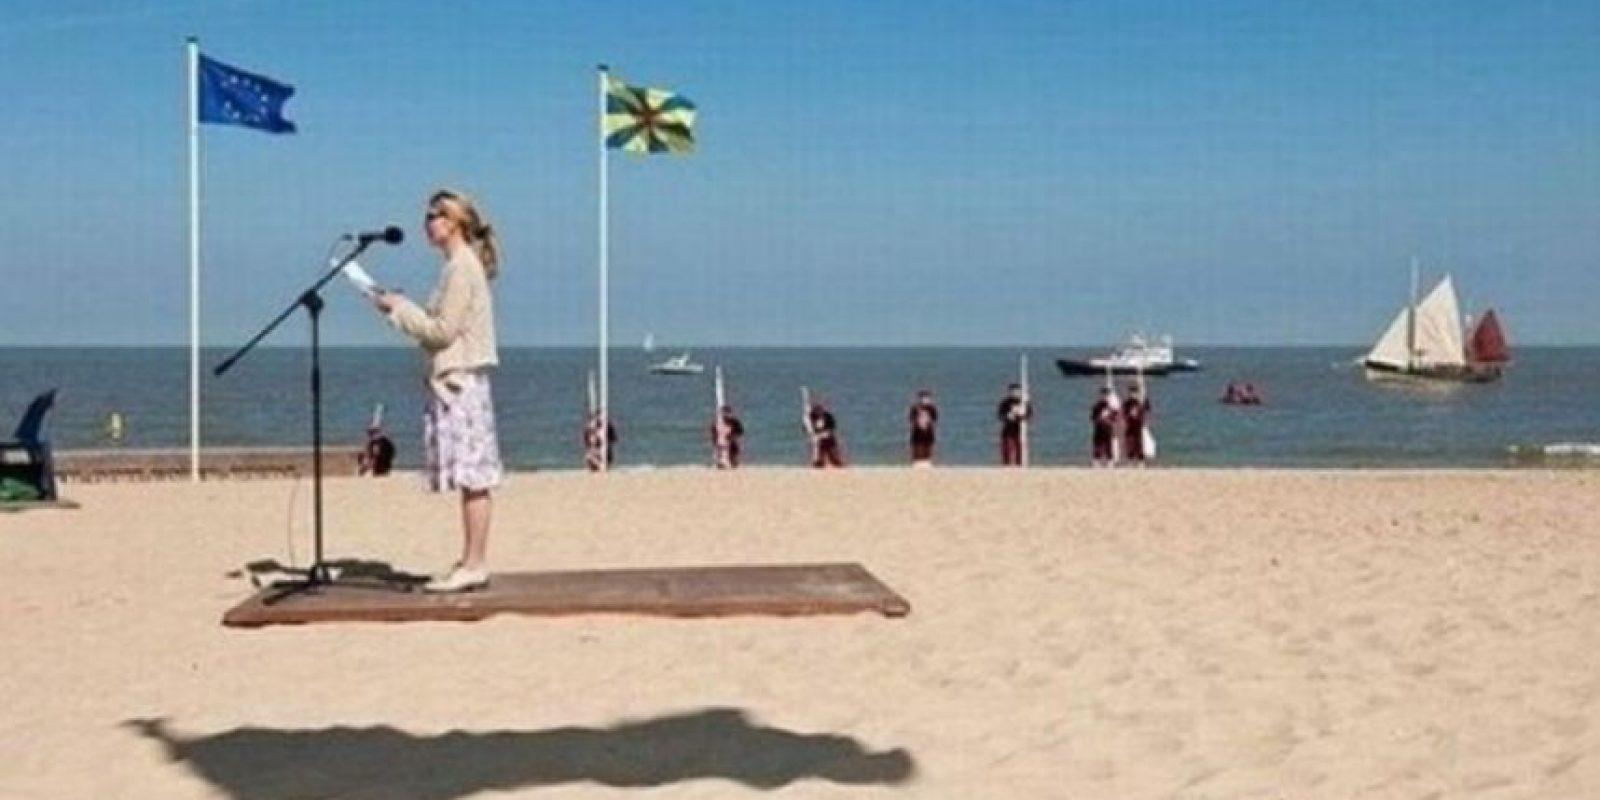 Ni ella vuela en una alfombra. Foto:Reddit